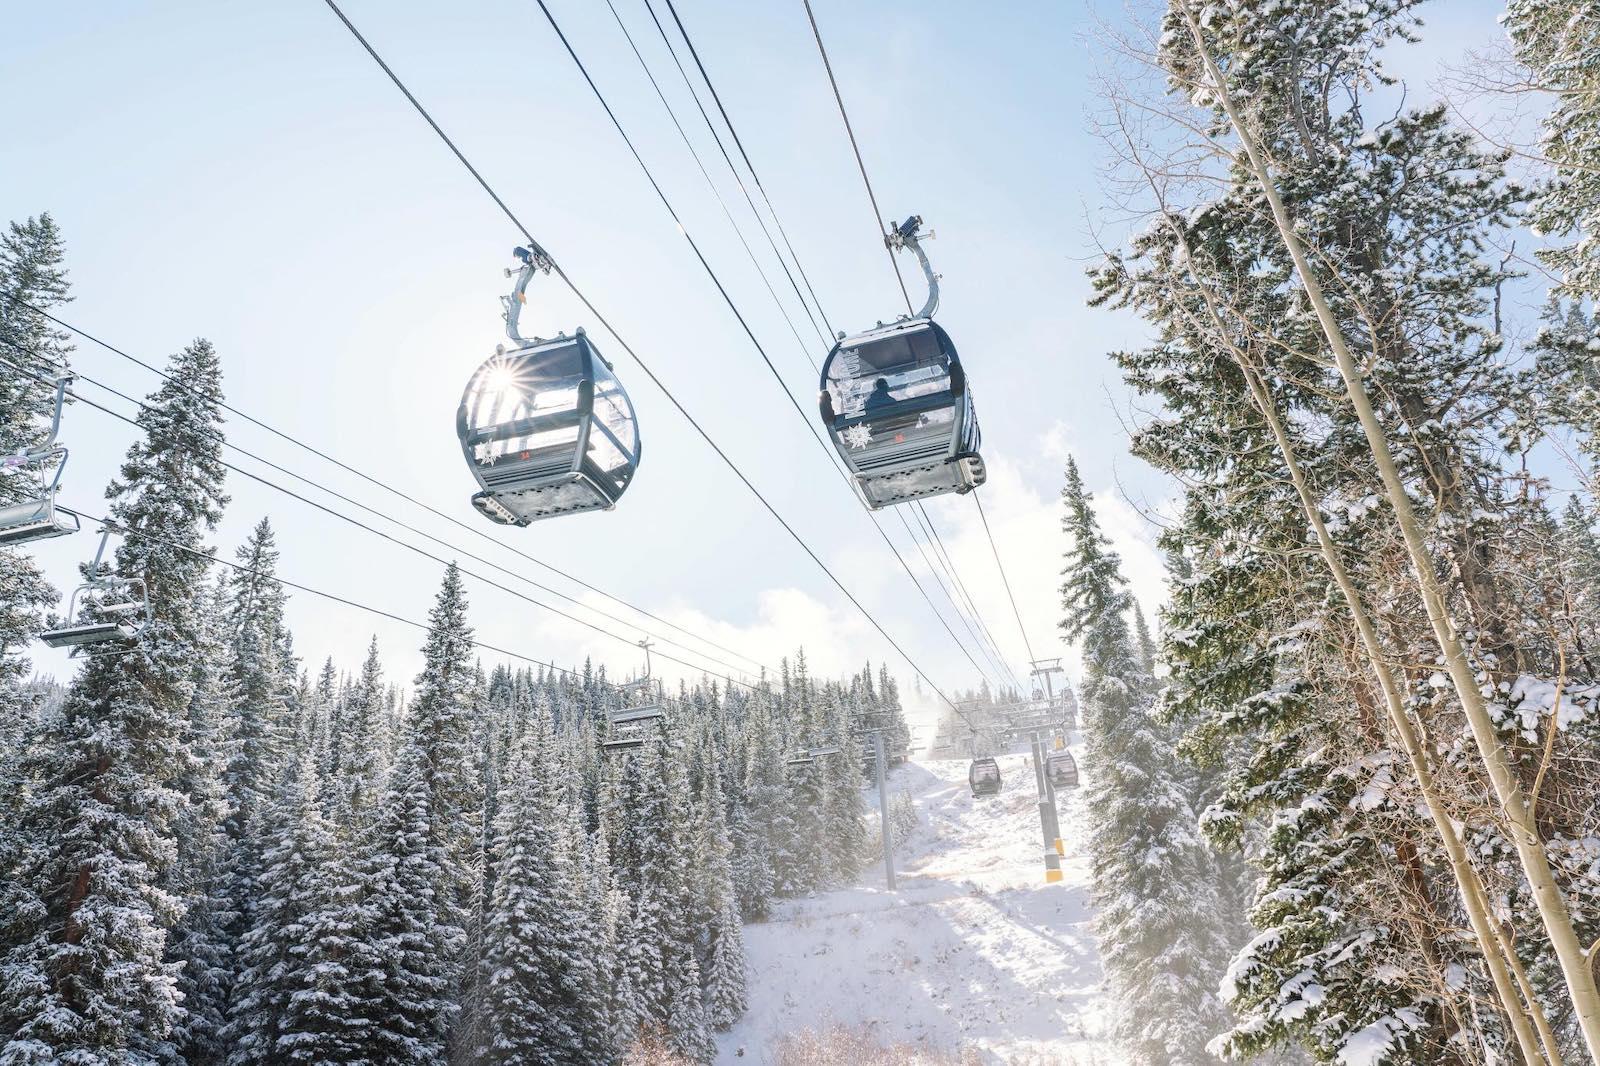 Image of two River Run Gondolas at Keystone Resort in Colorado during winter